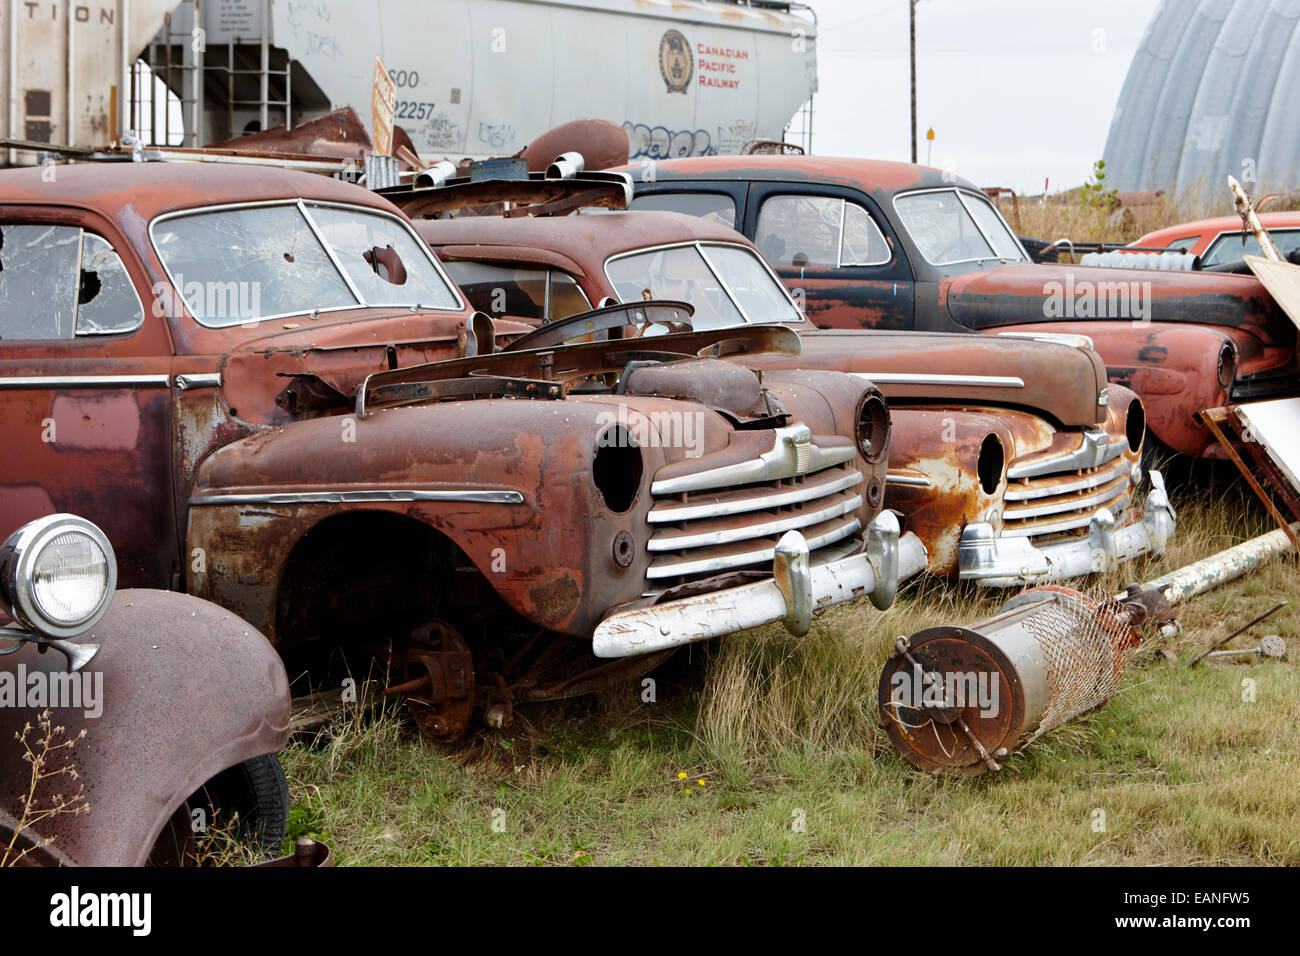 vintage historic chevrolet and ford vehicles in junkyard Saskatchewan Canada - Stock Image